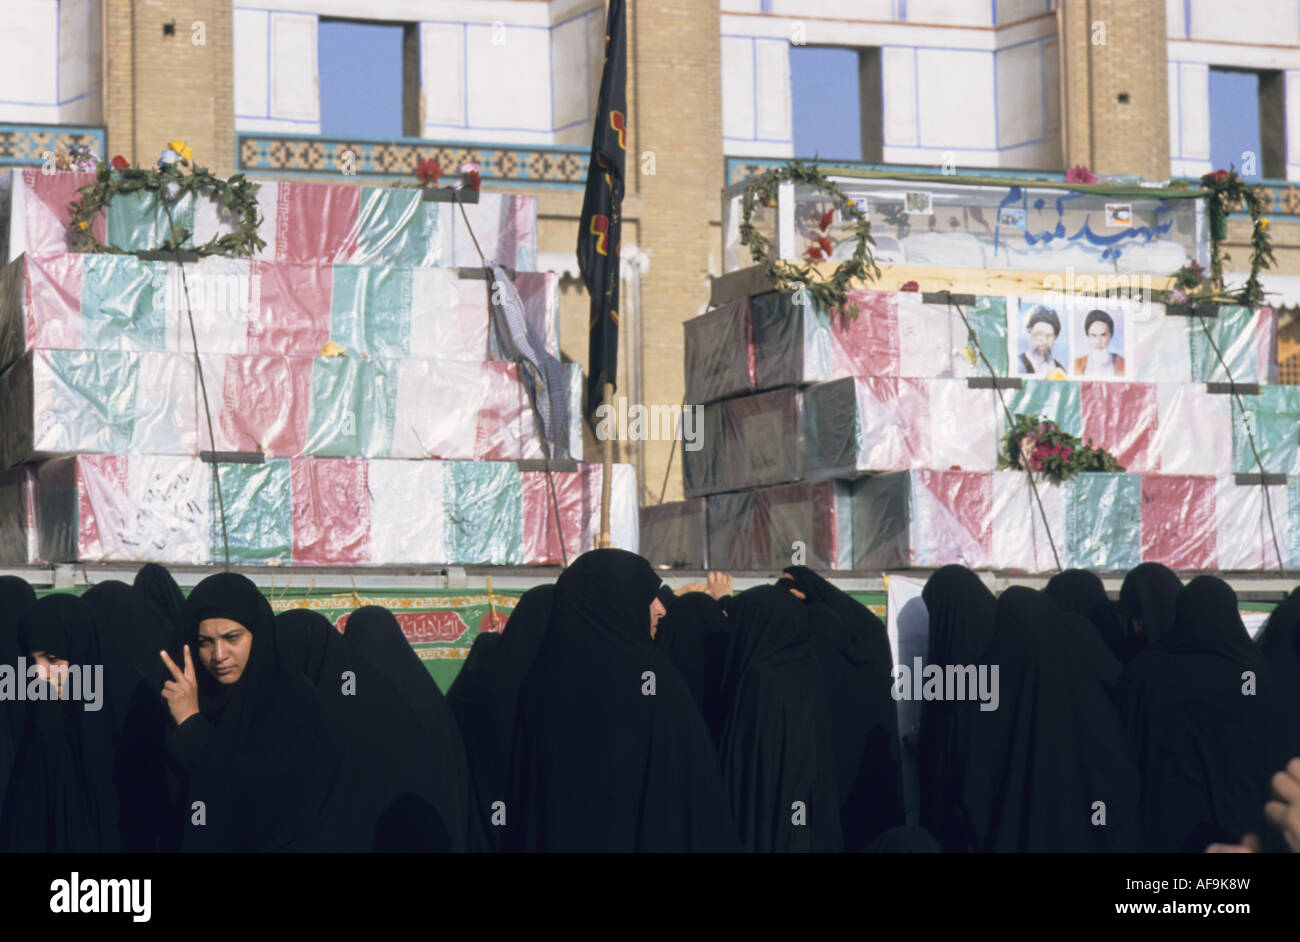 Day of Ashura, women in hijabs, Iran, Isfahan - Stock Image